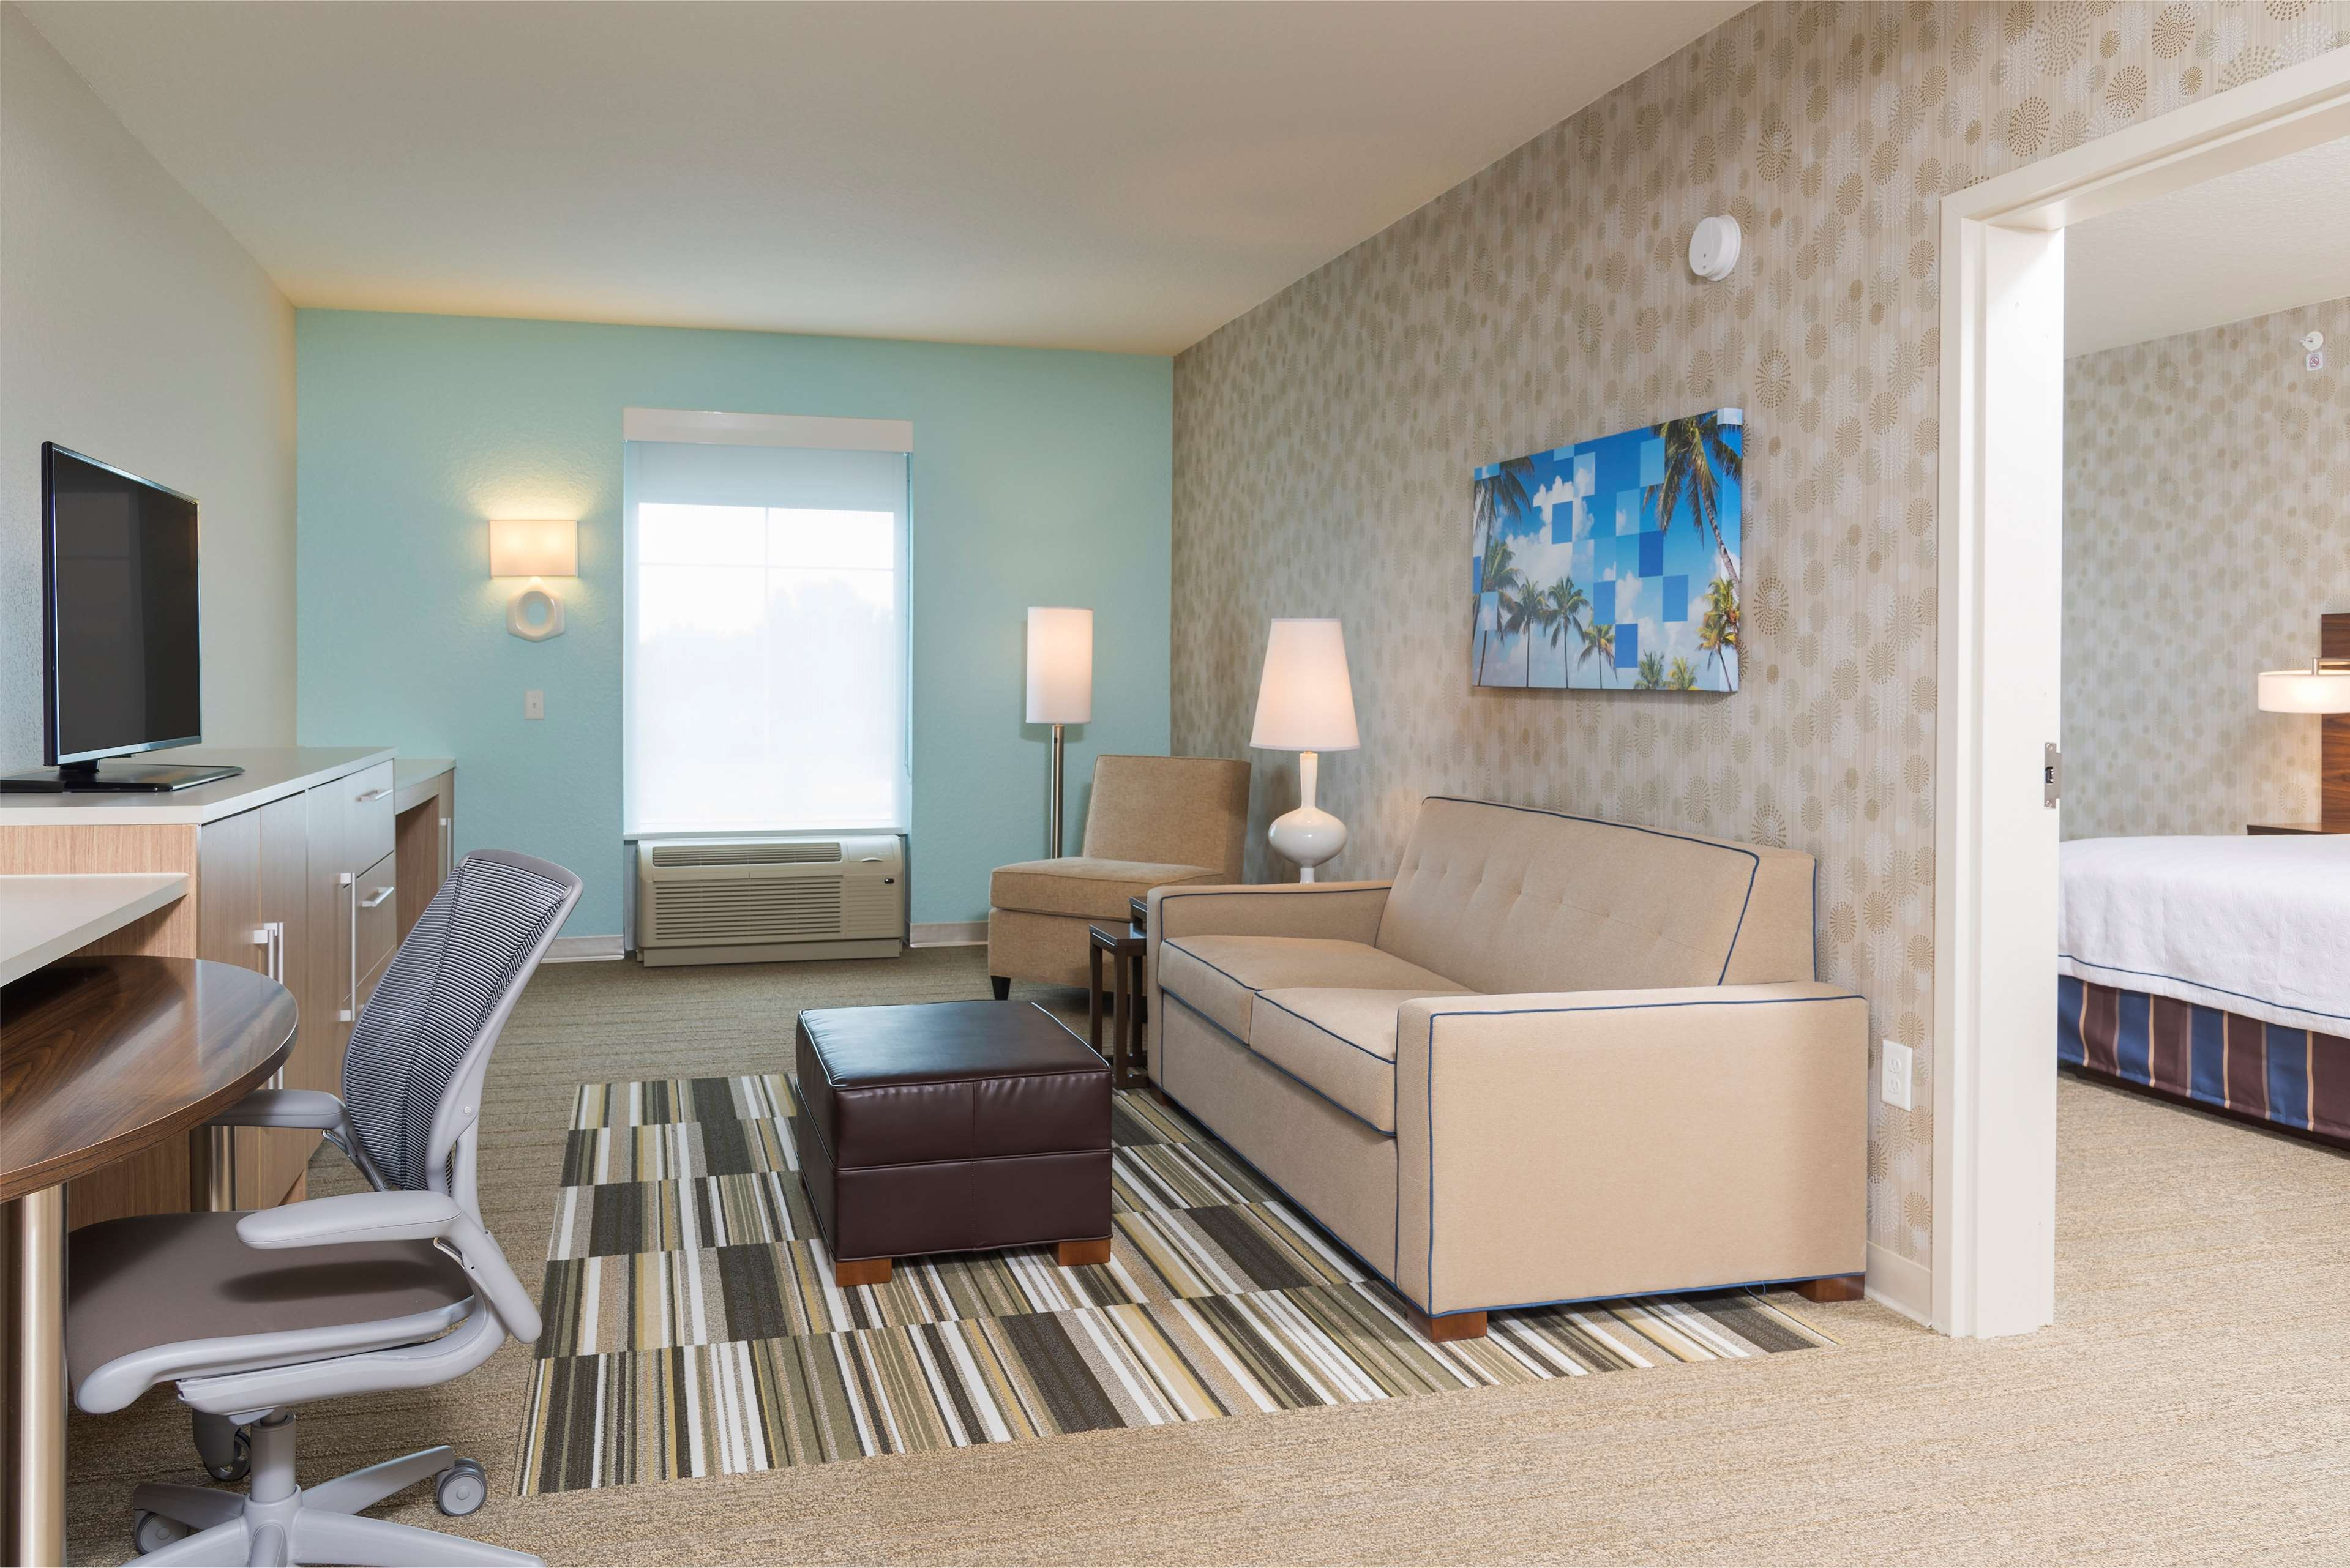 Home2 Suites by Hilton Nokomis Sarasota Casey Key image 19